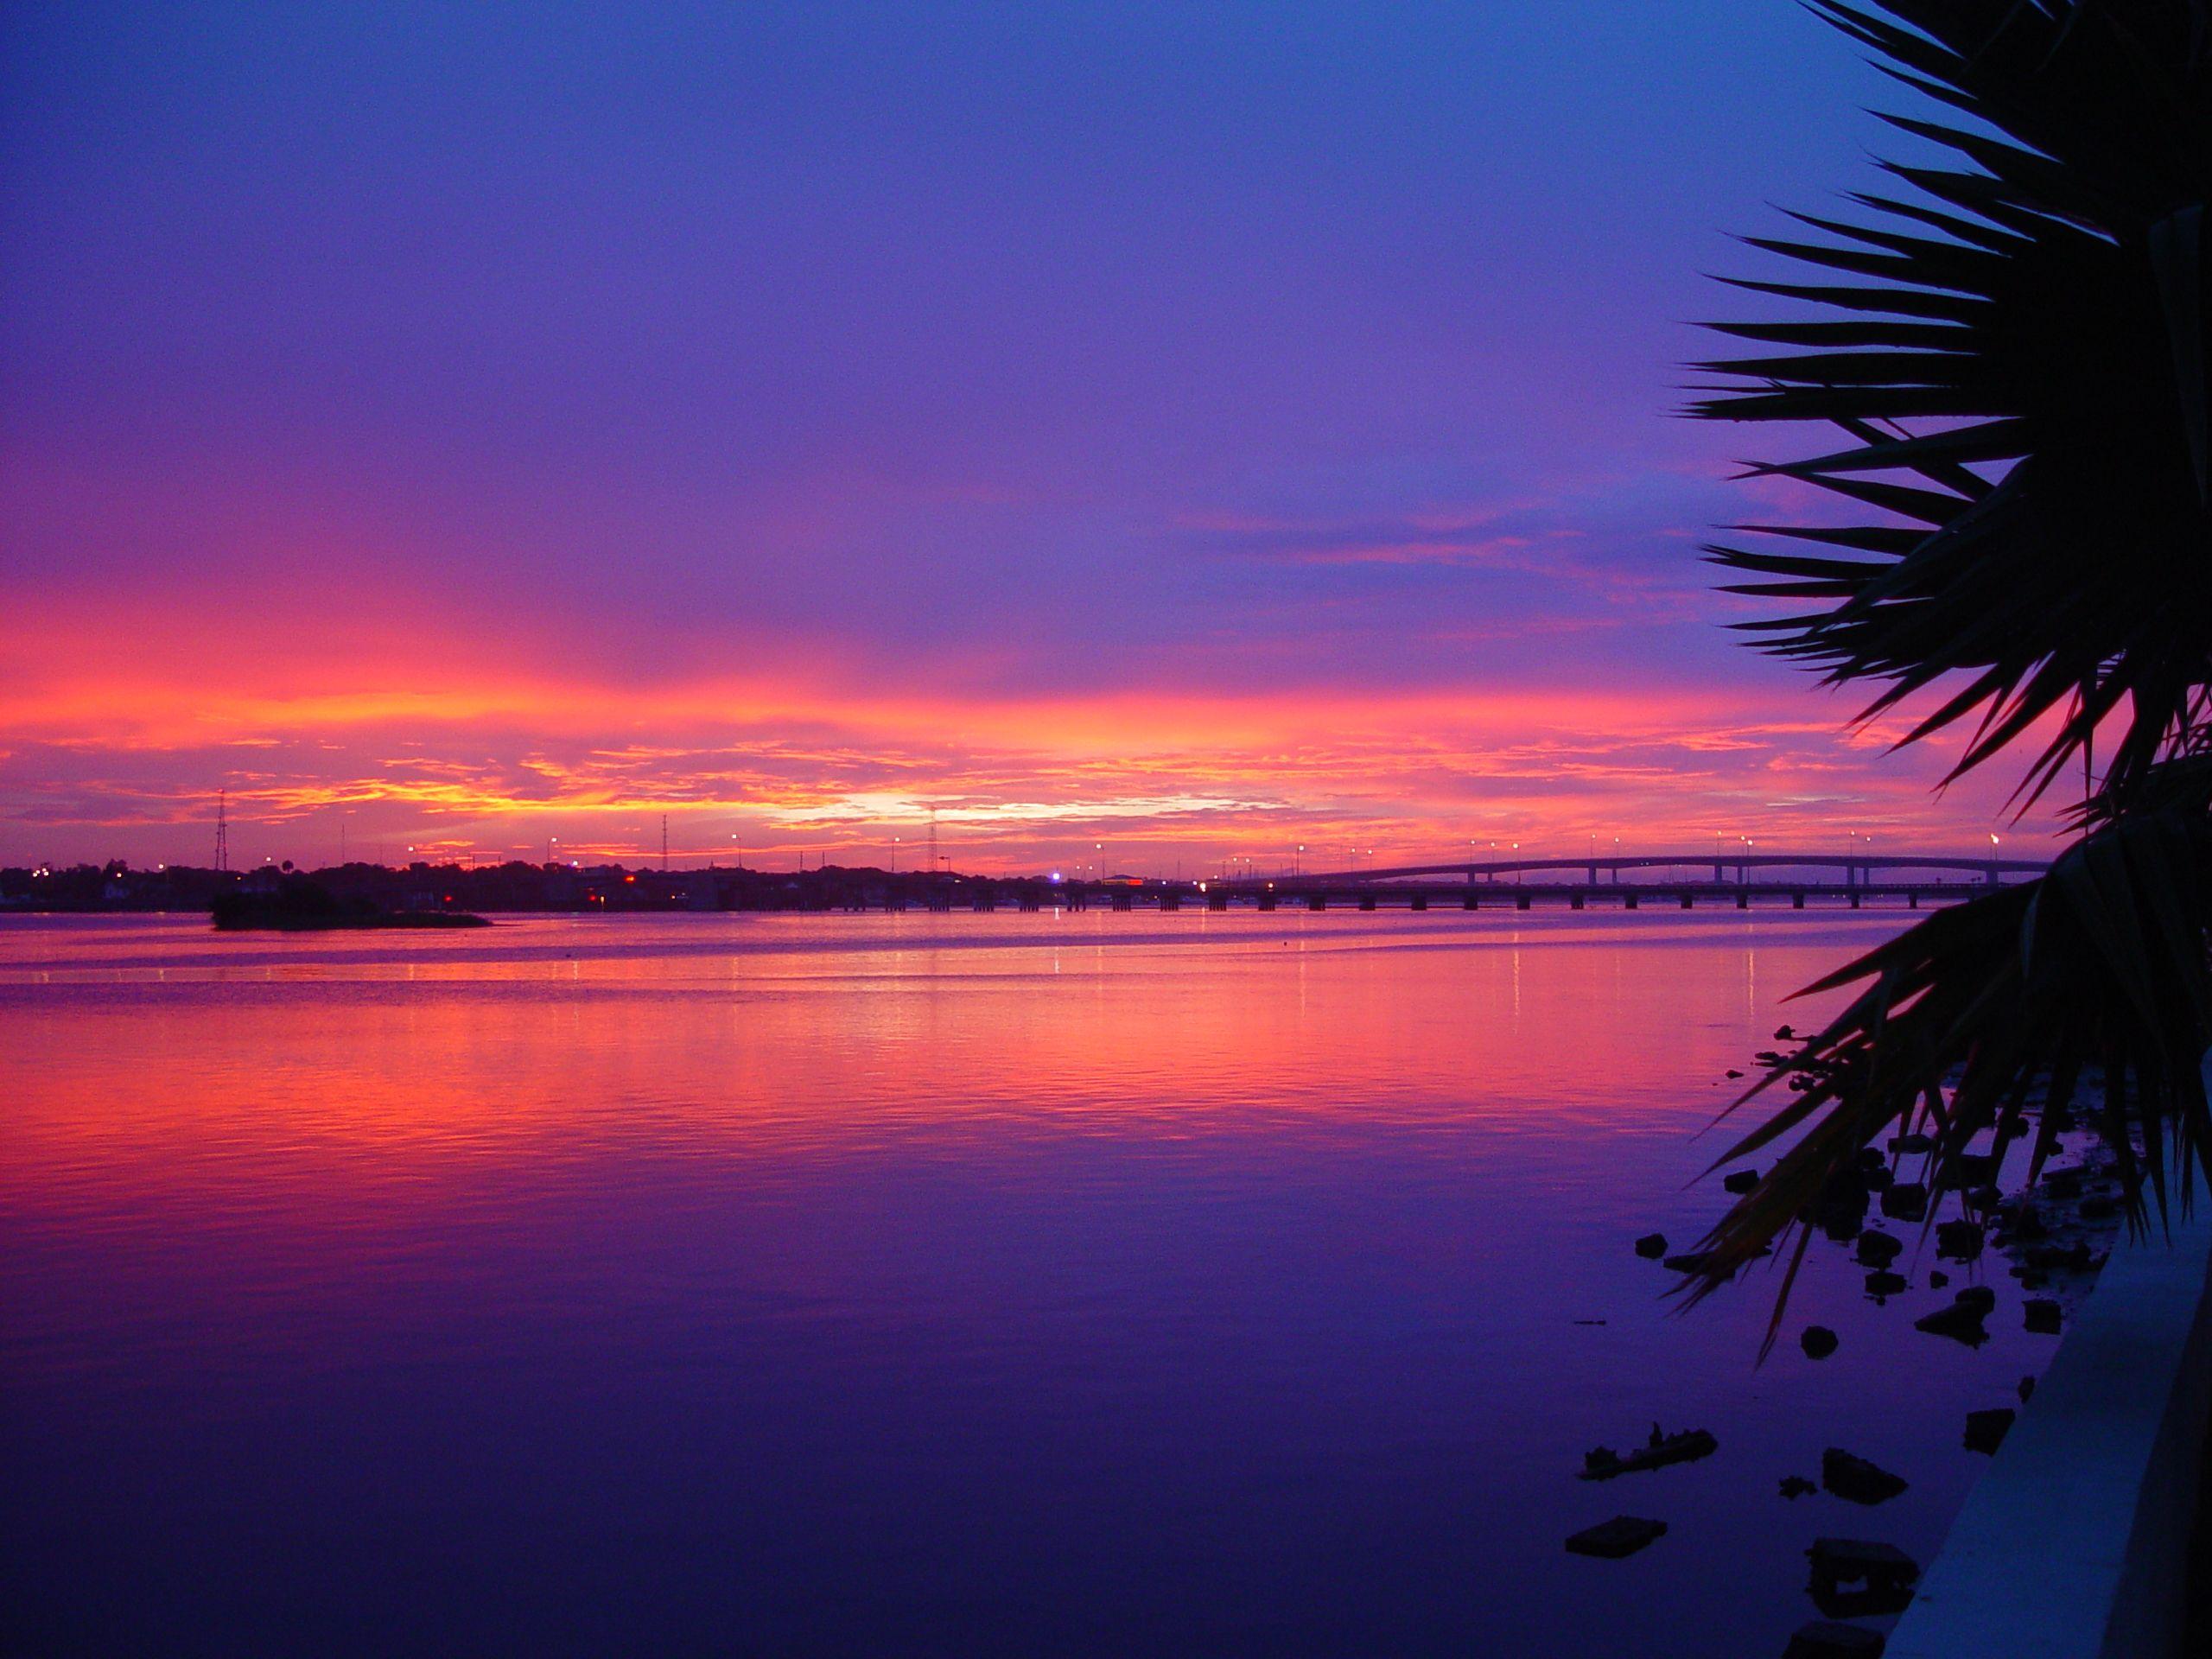 Daytona Beach Halifax River Tropical Palm Tree Sunset Beach Sunset Wallpaper Beach Sunset Tree Sunset Wallpaper